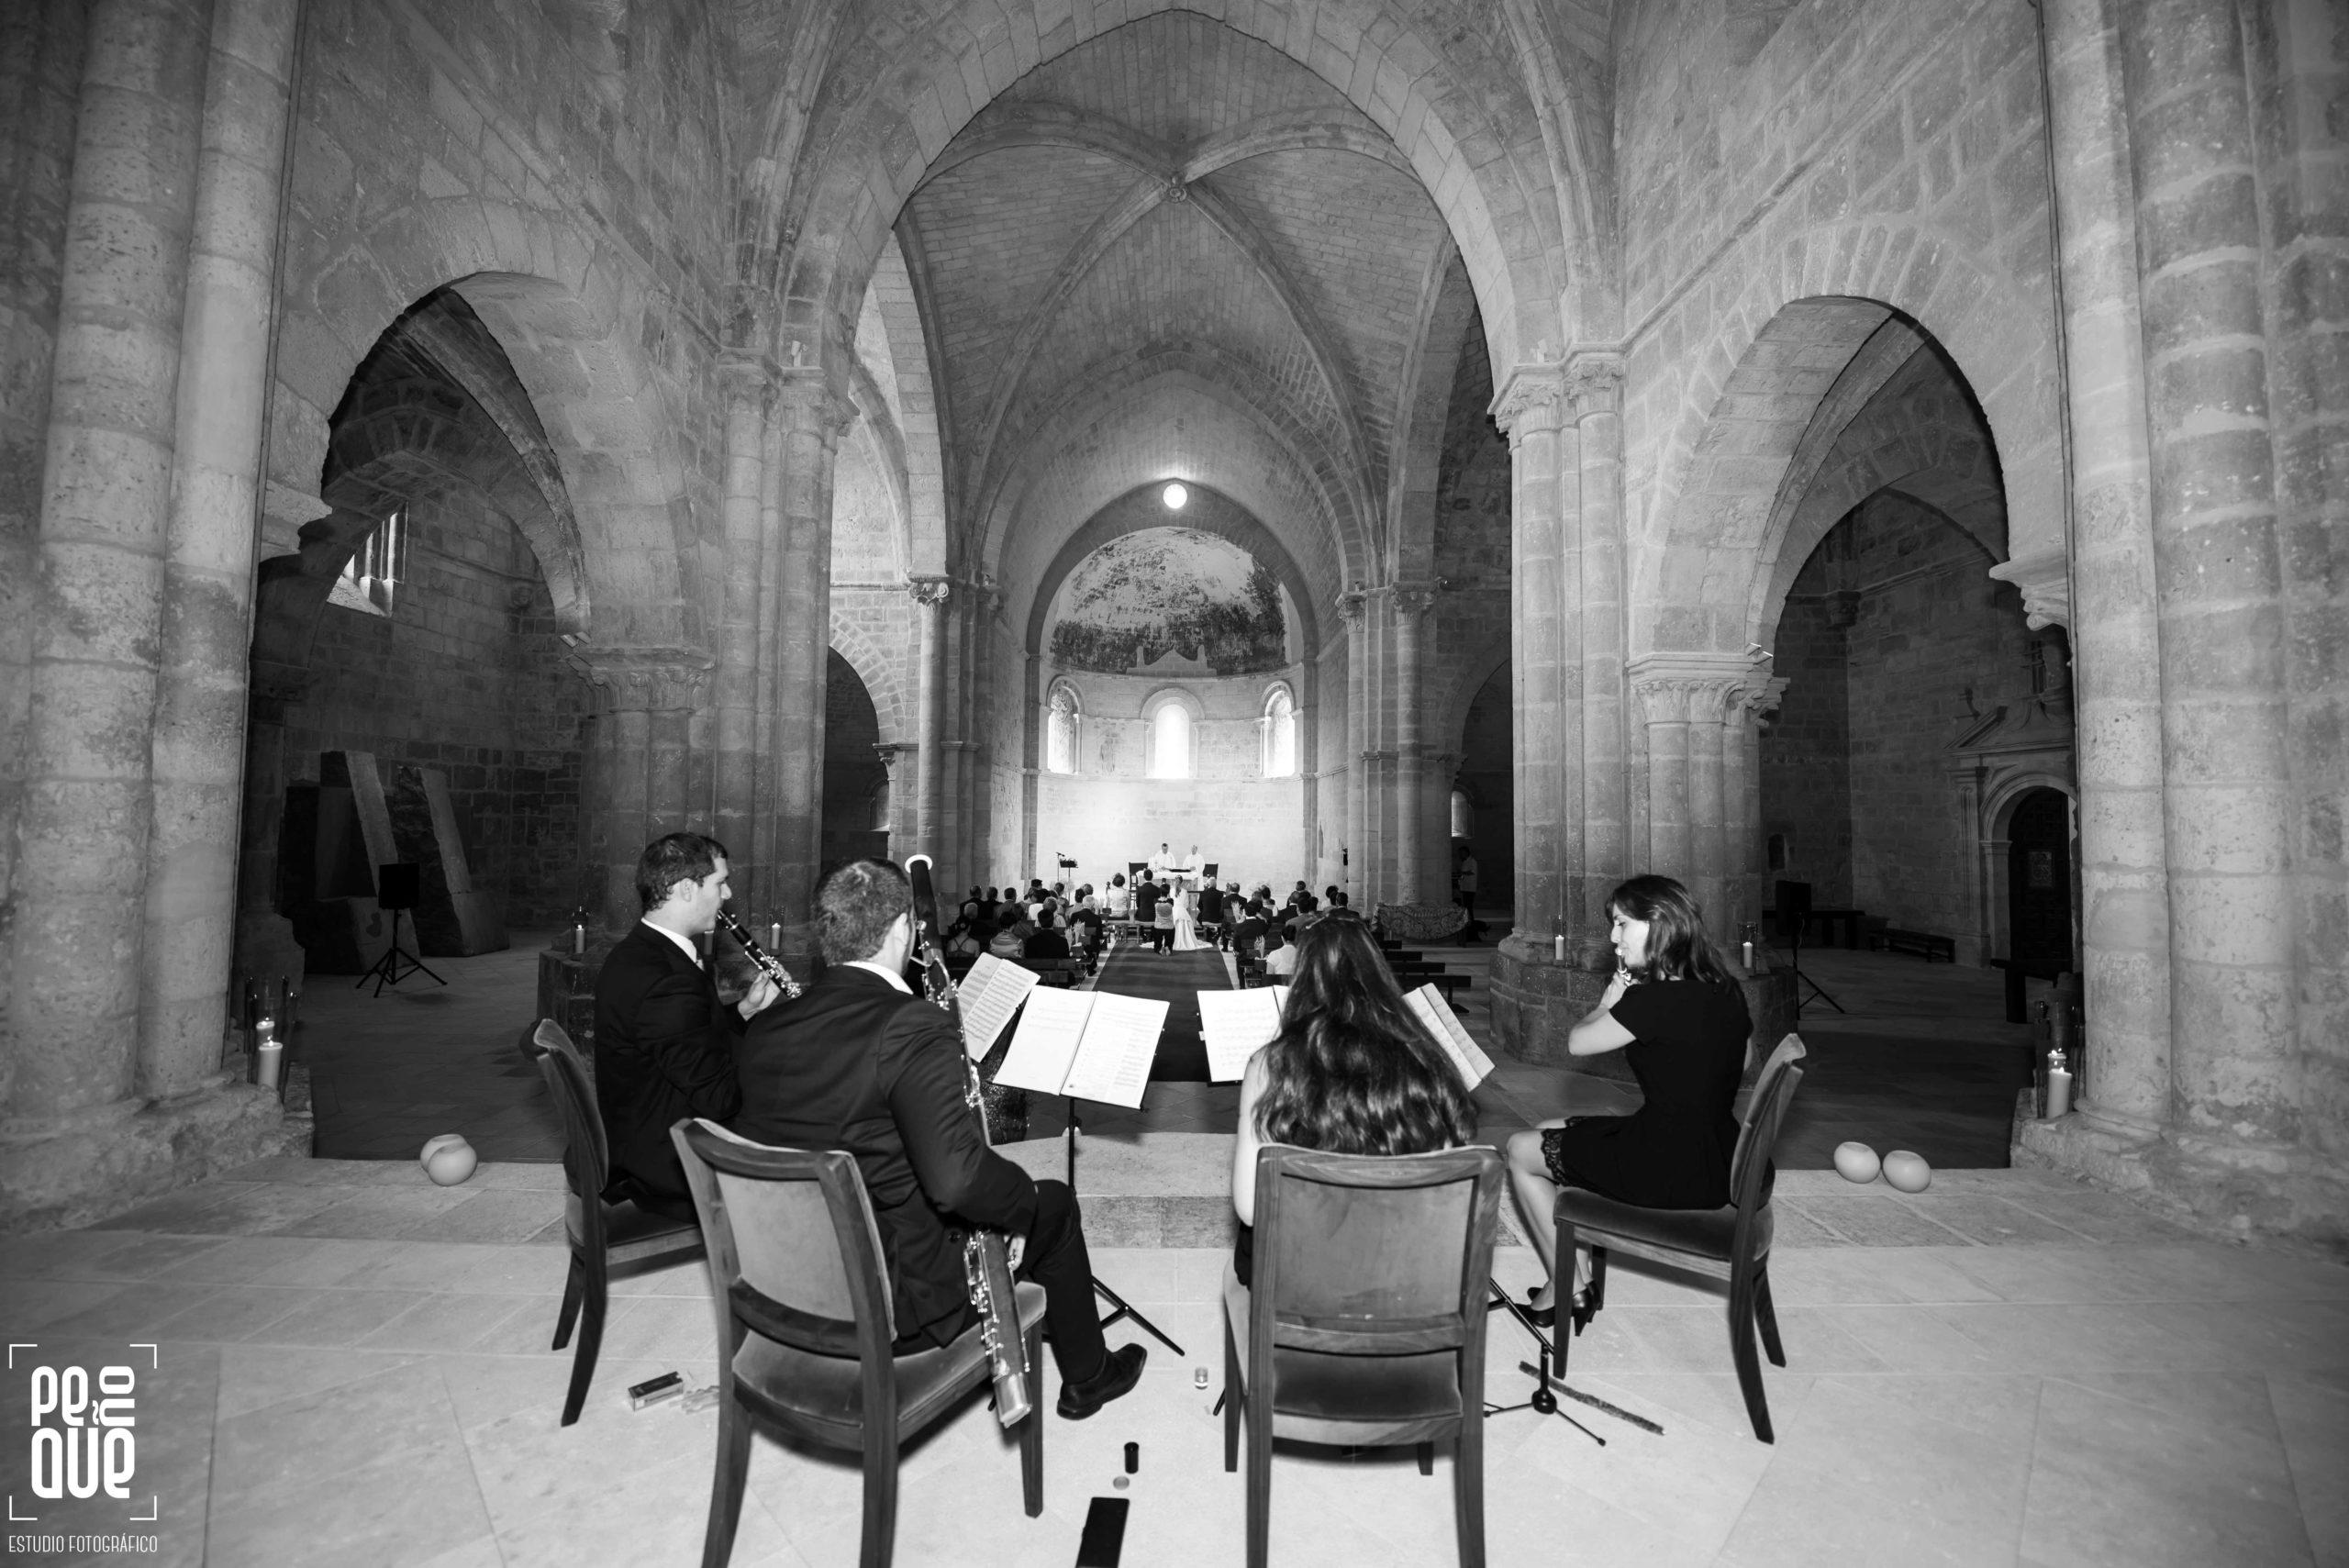 concierto durante ceremonia del grupo Scherzo